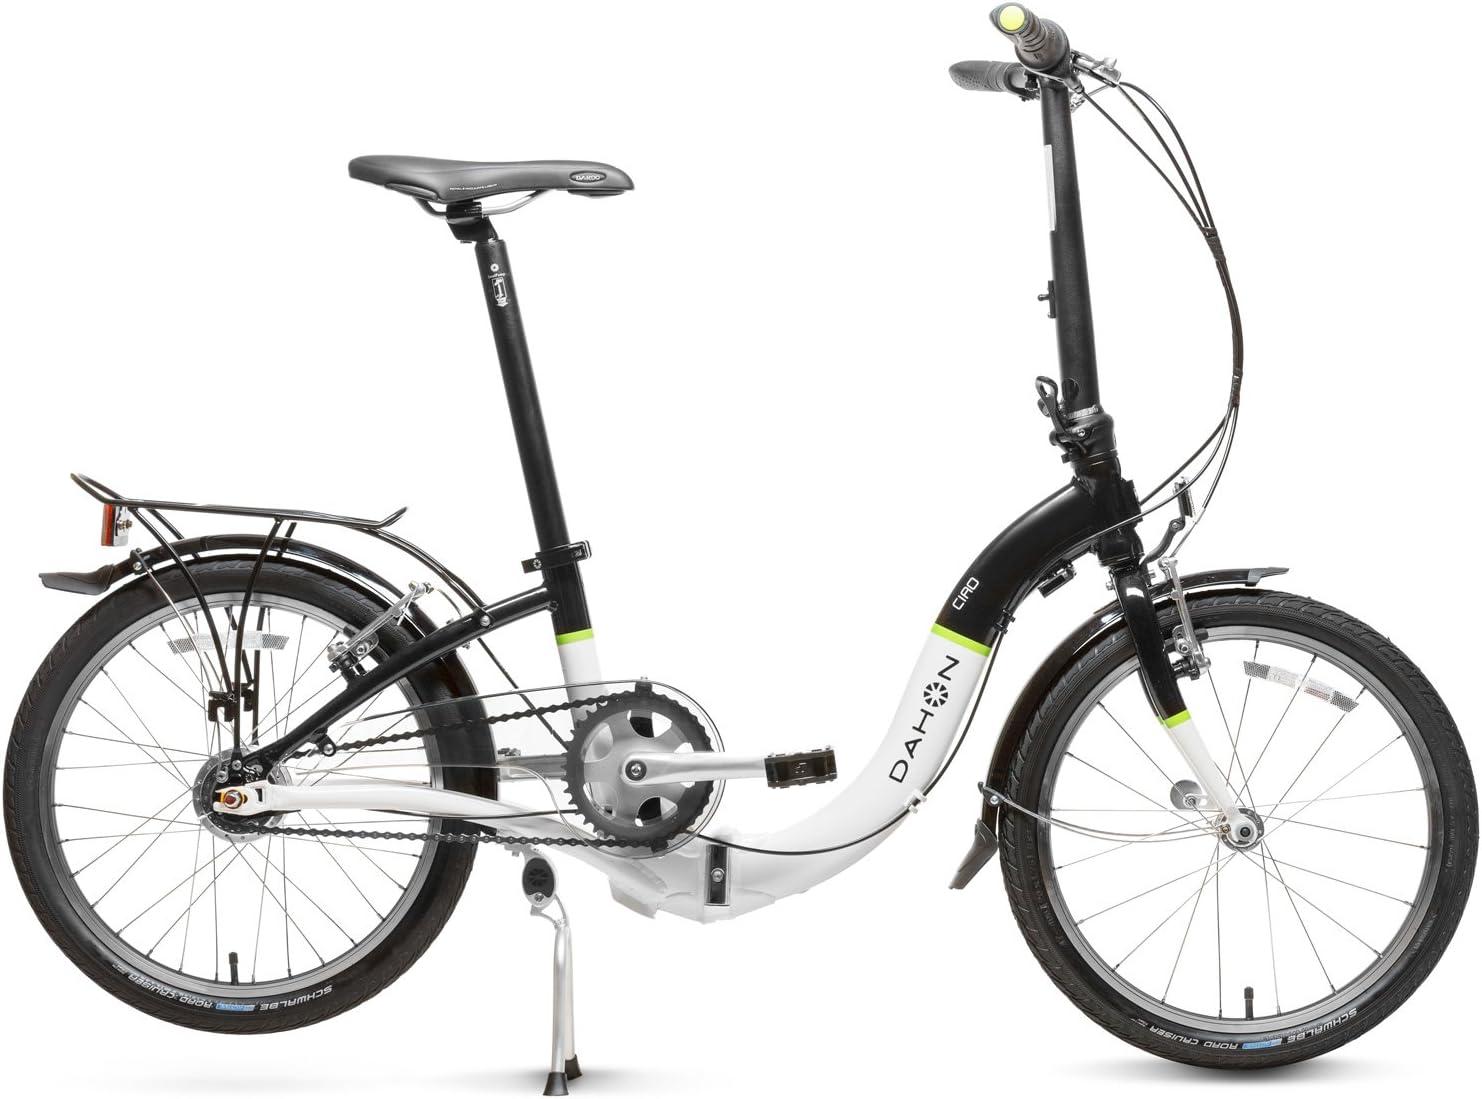 Dahon Ciao I7 Bicicleta Plegable, Unisex Adulto, Sable Frost, 20 ...